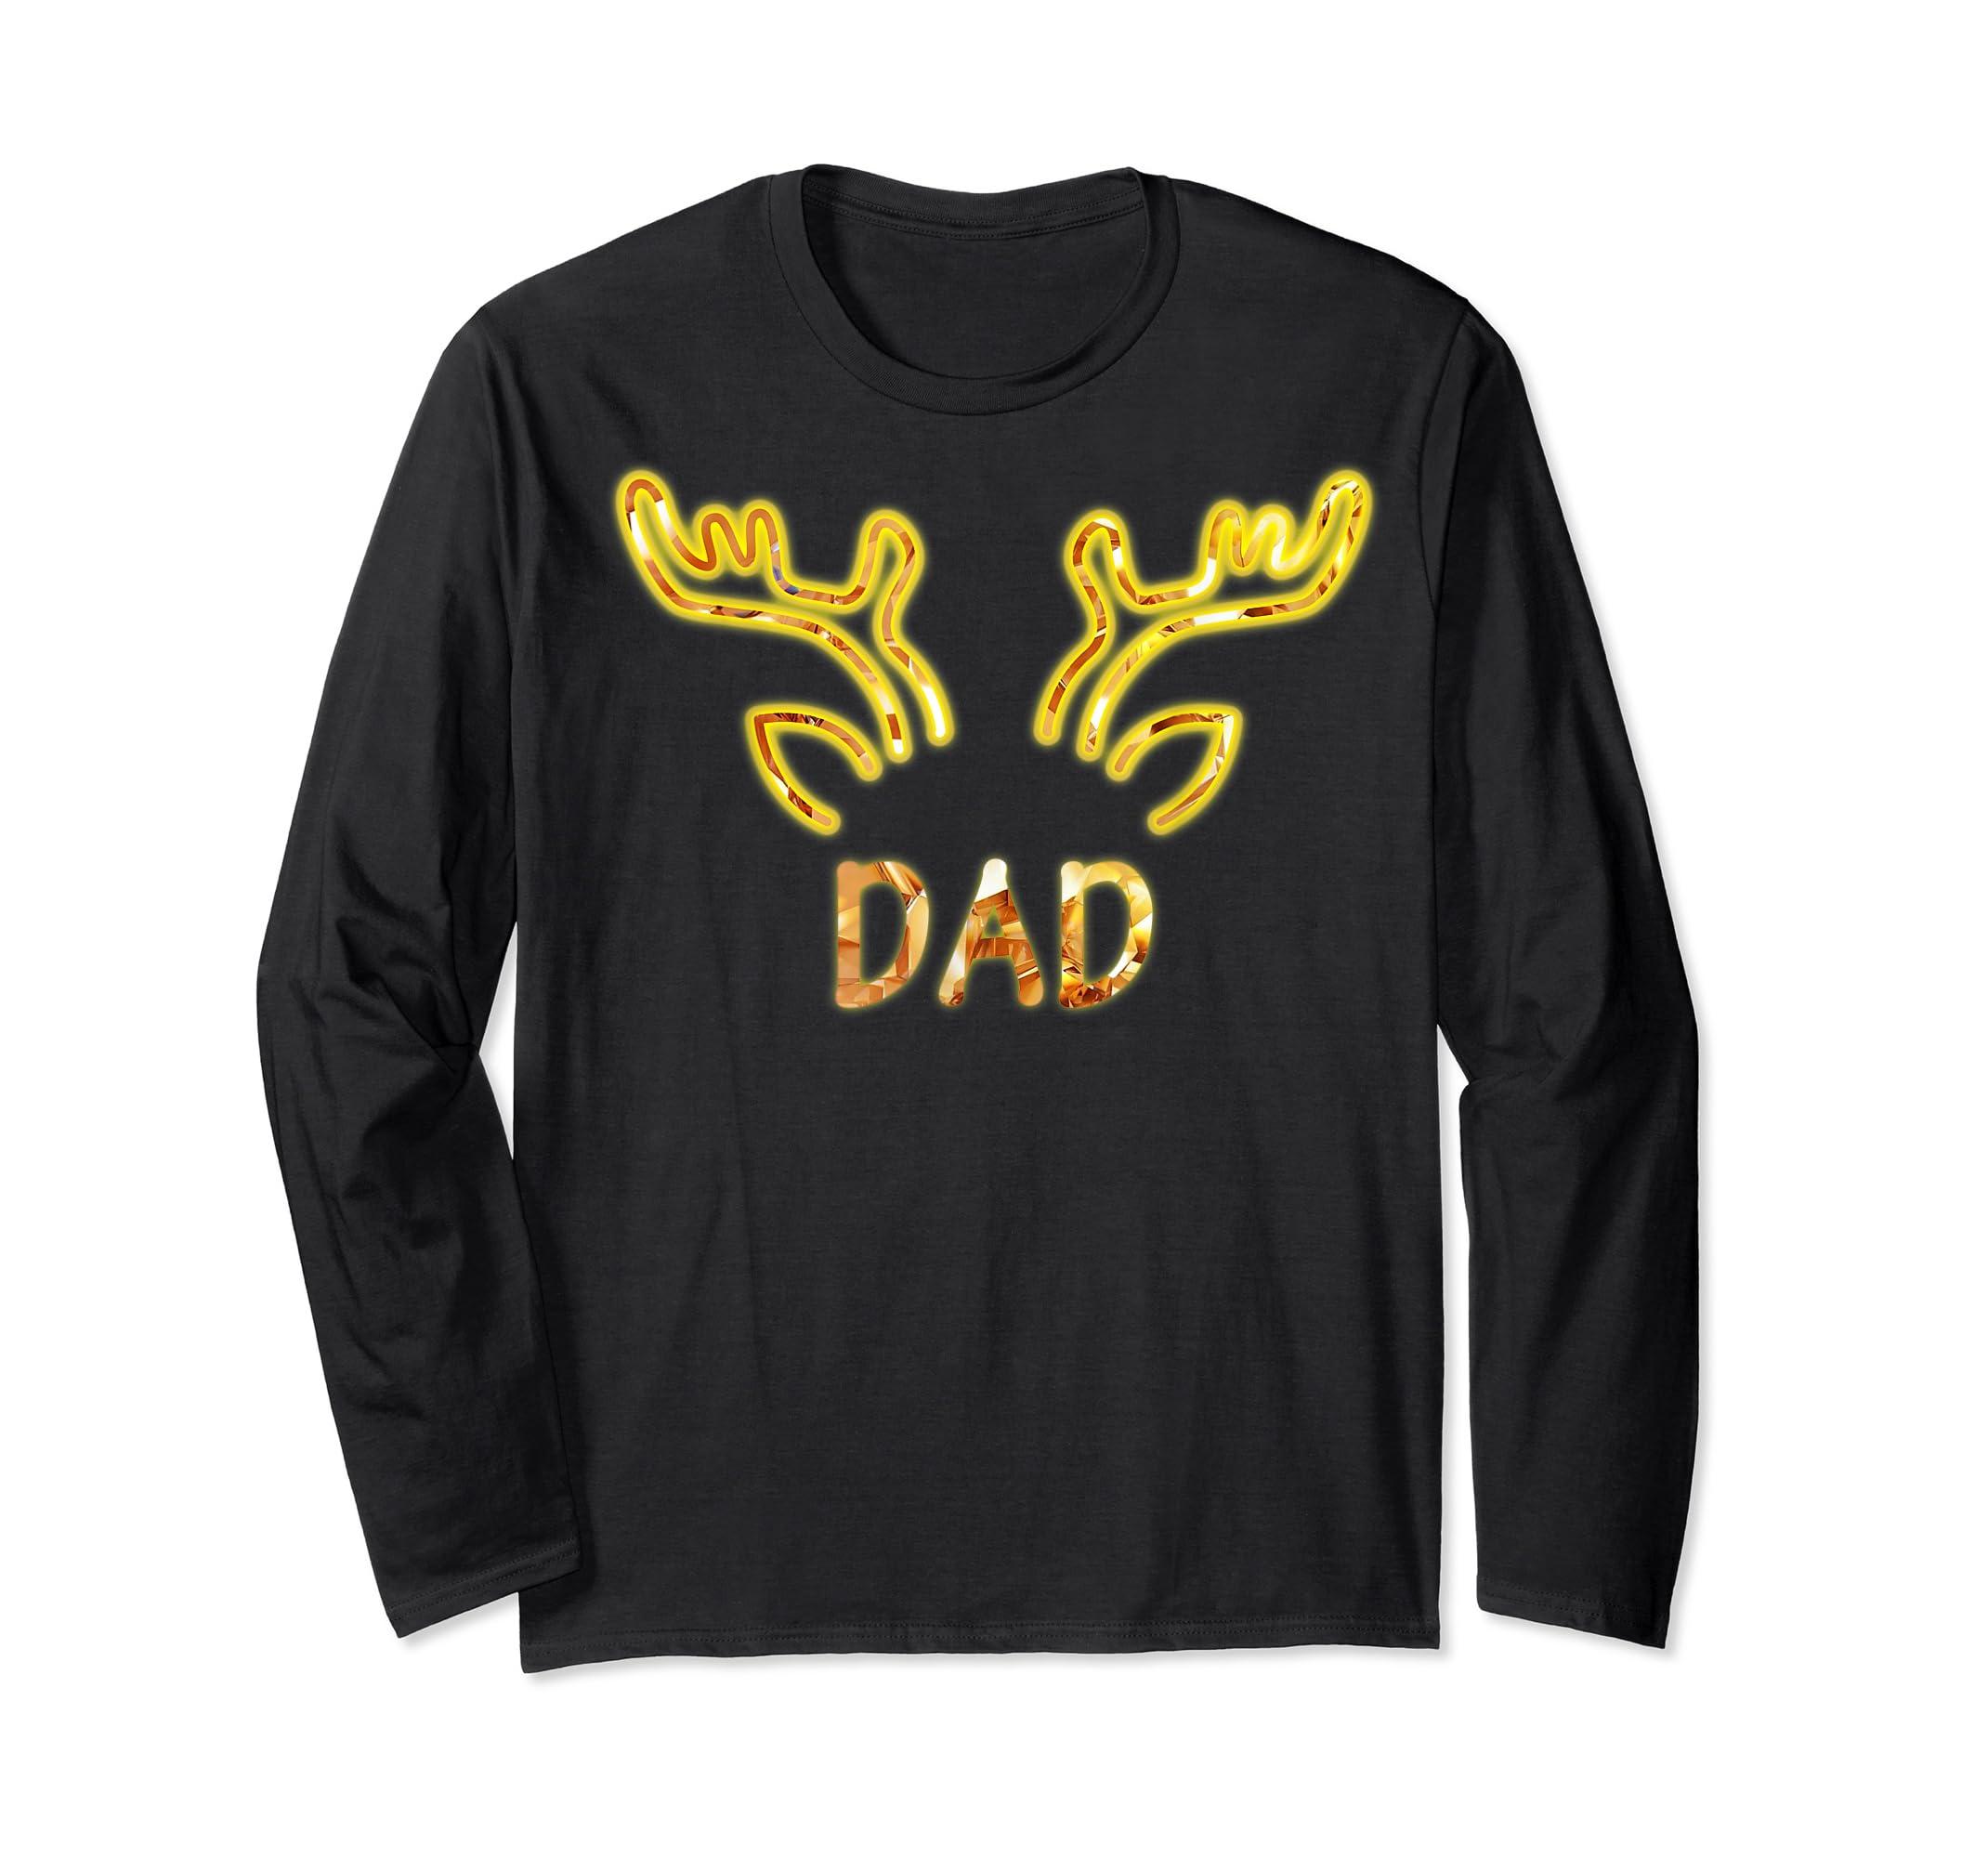 Dad Reindeer Matching Family Christmas T-Shirt T-Shirt-Long Sleeve-Black